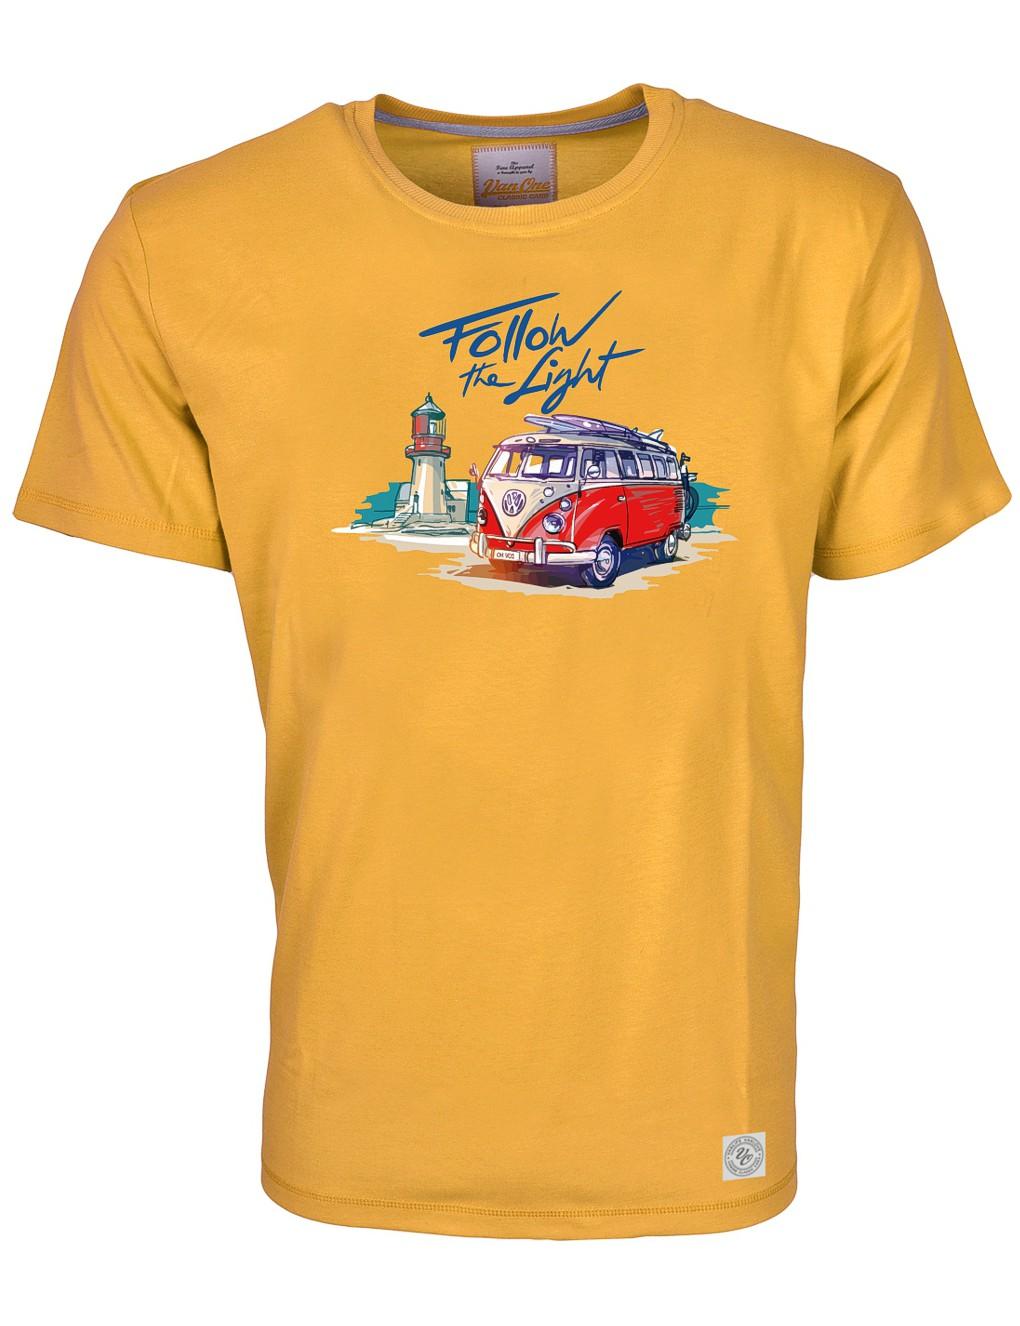 Herren T-Shirt VW Bulli »FOLLOW THE LIGHT« Gelb